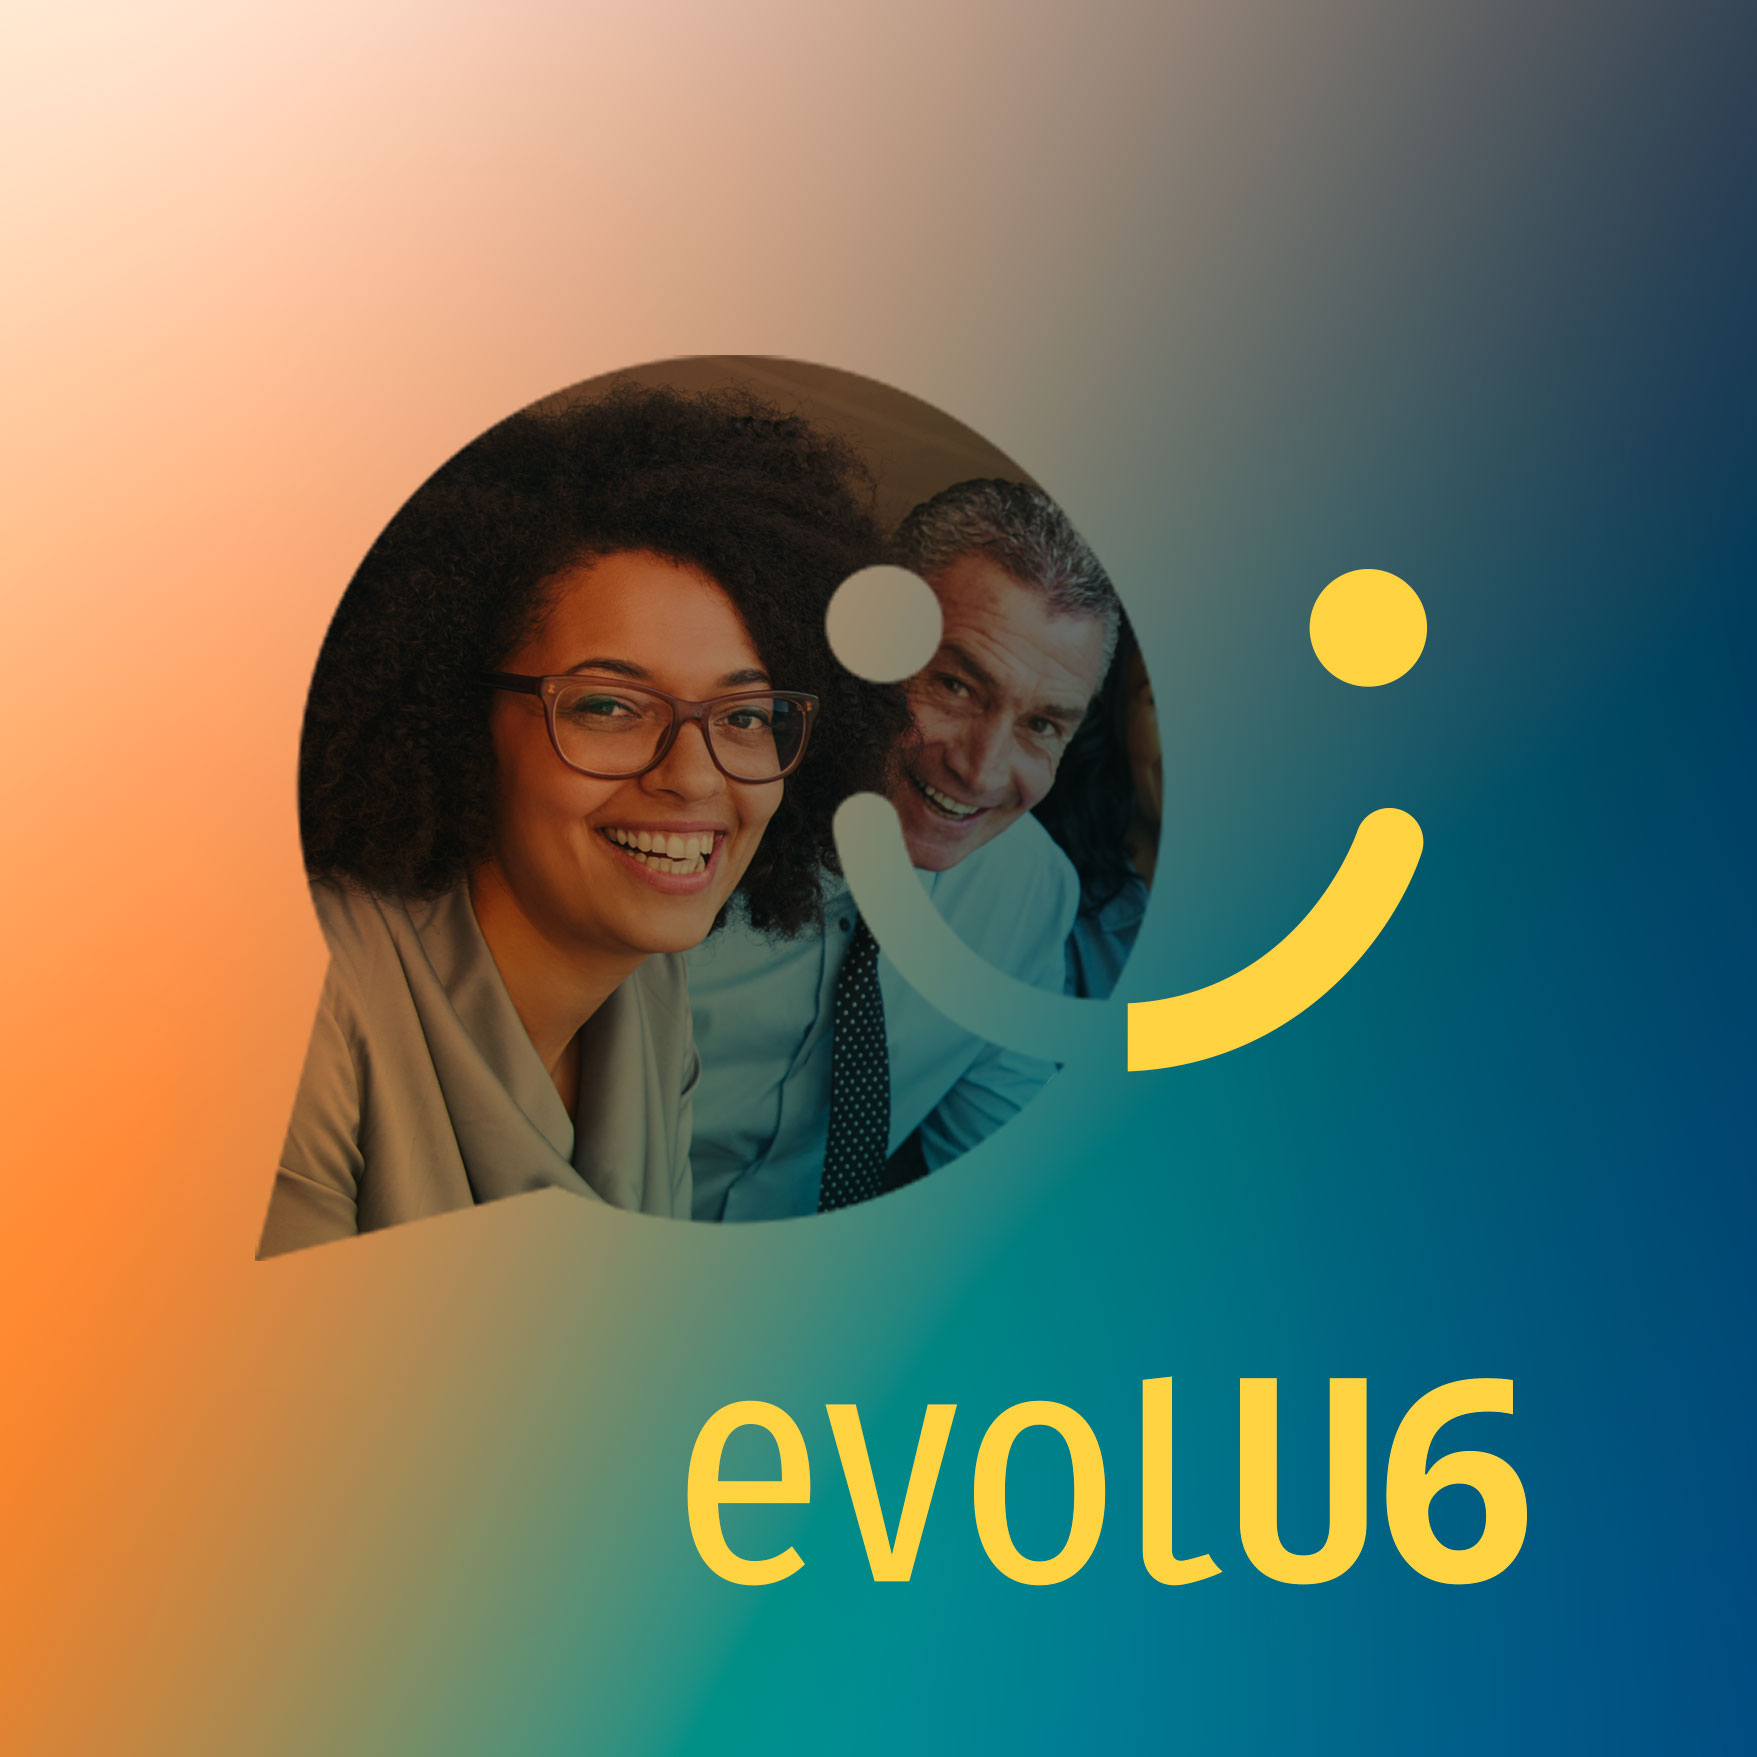 Evolu6 : Identité visuelle & print